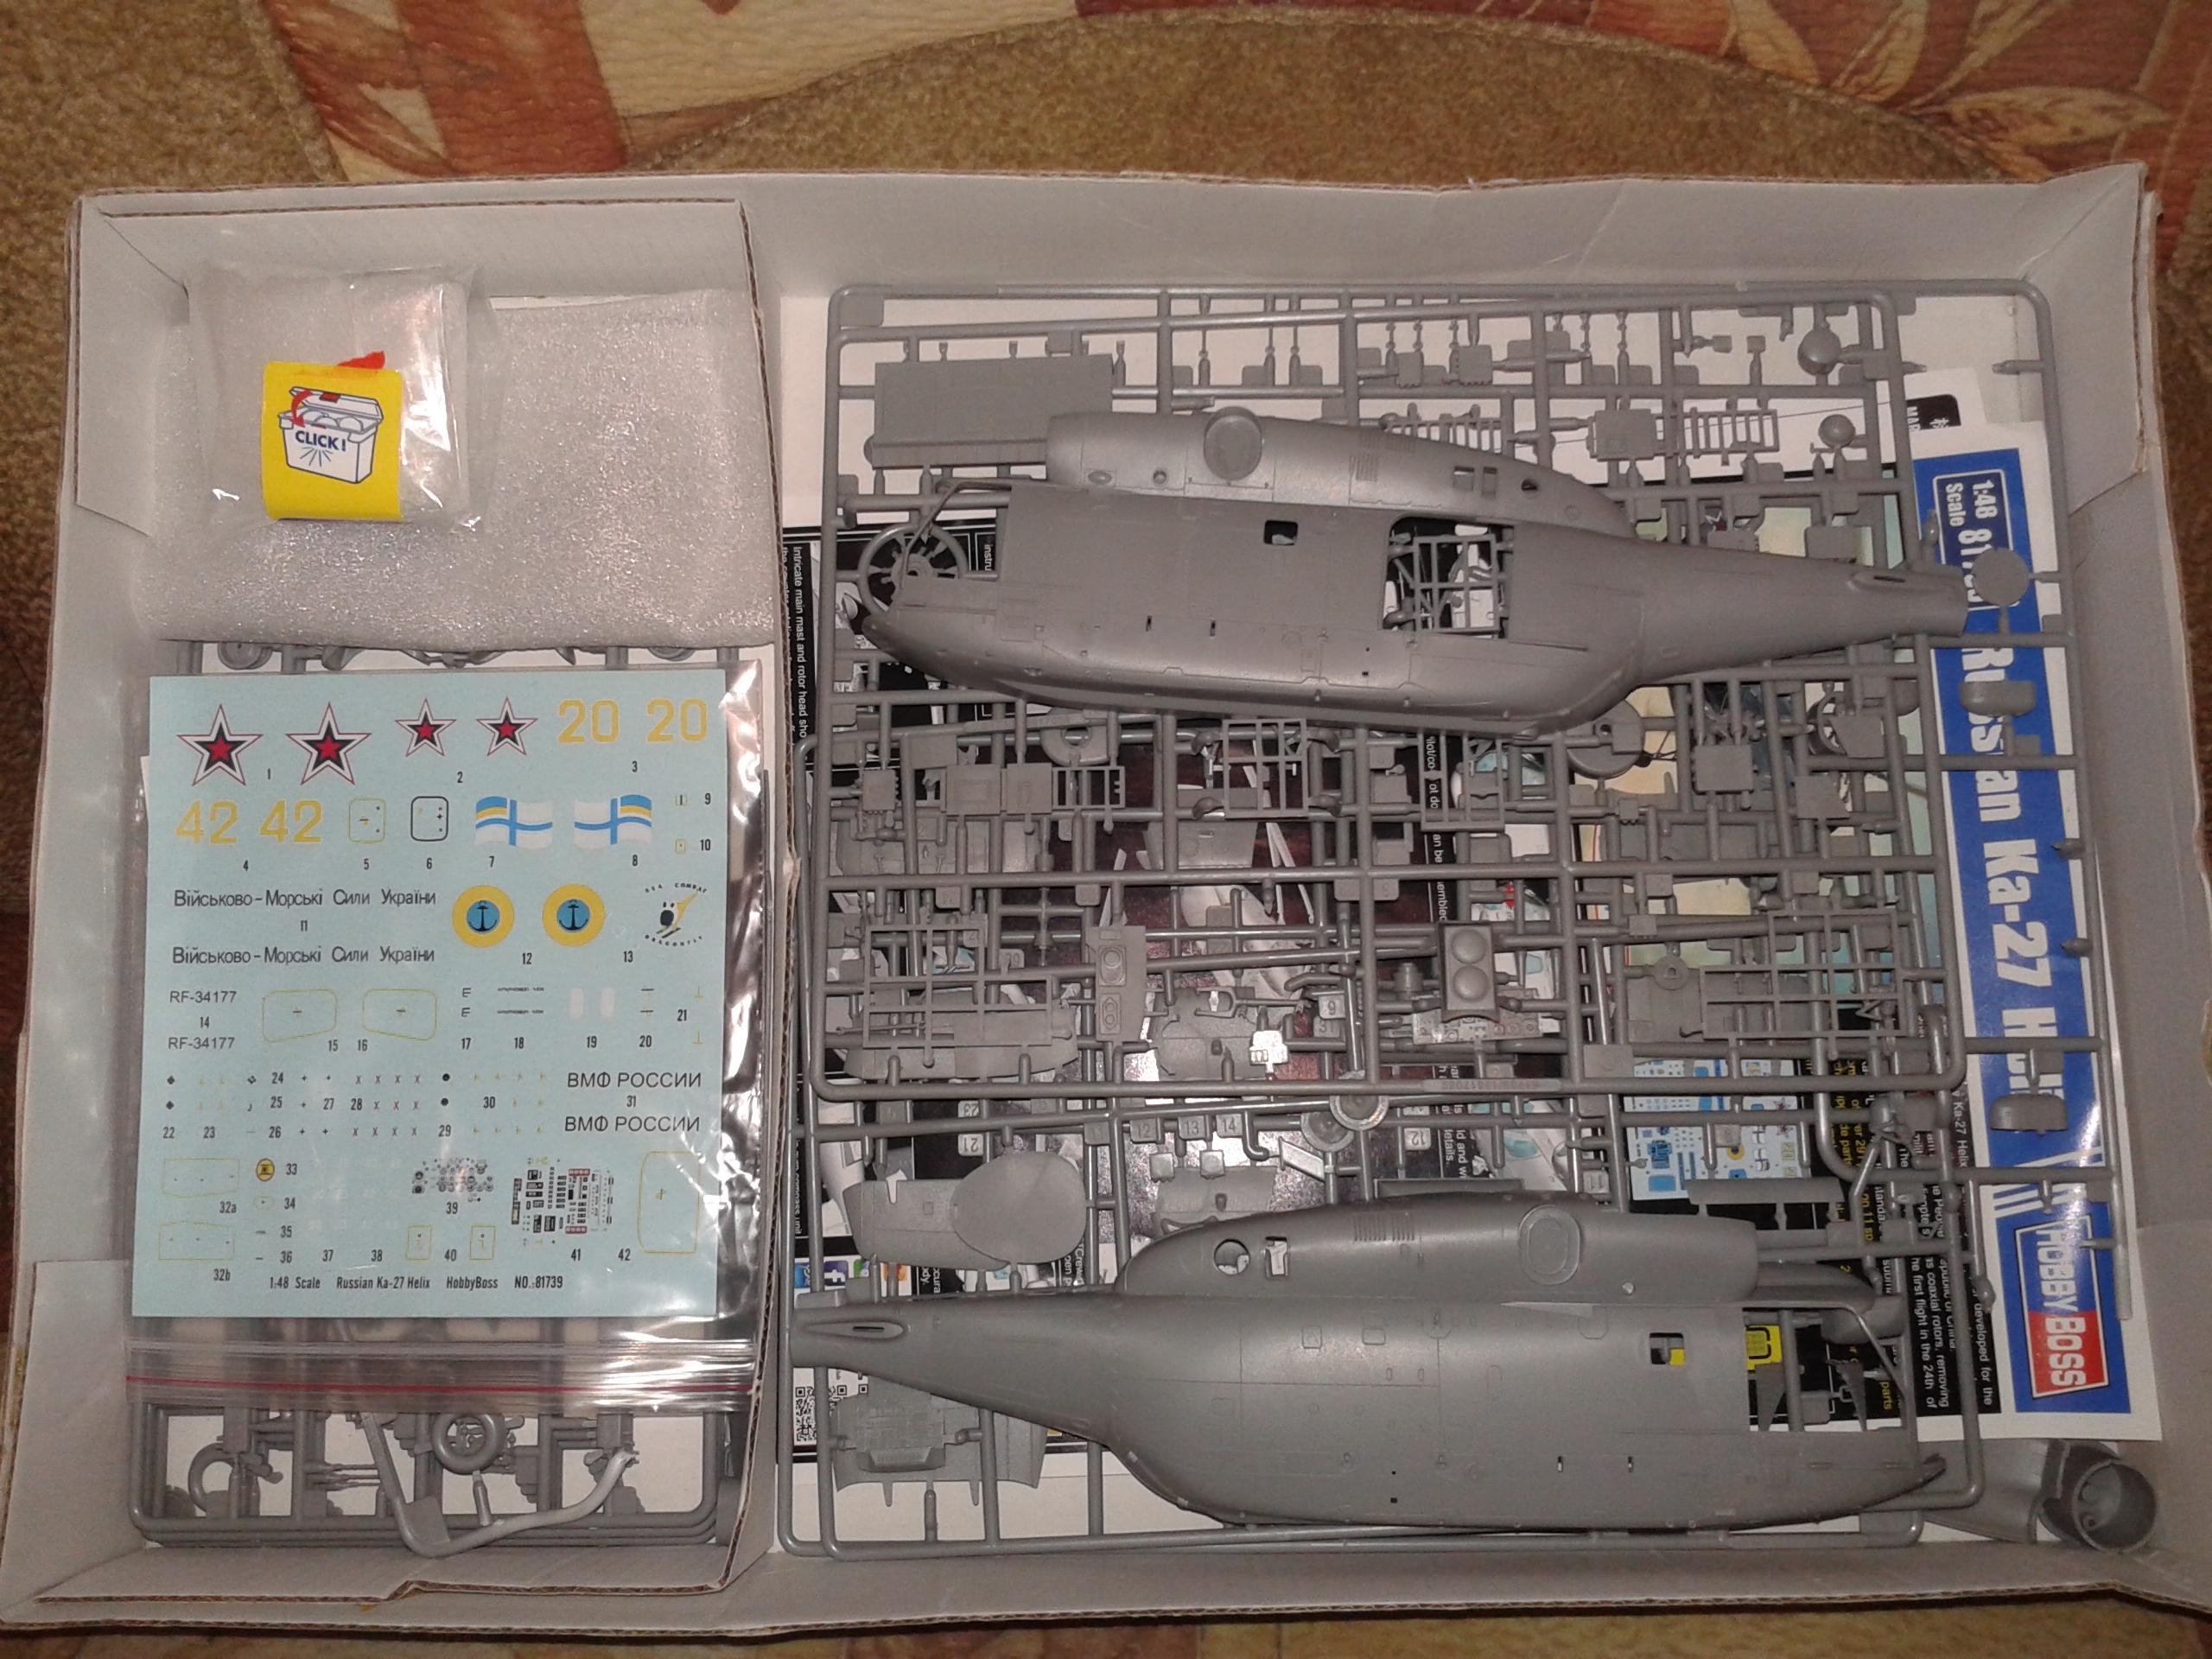 Ка-27ПЛ 1/48 HOBBYBOSS 83c96ac1eed3